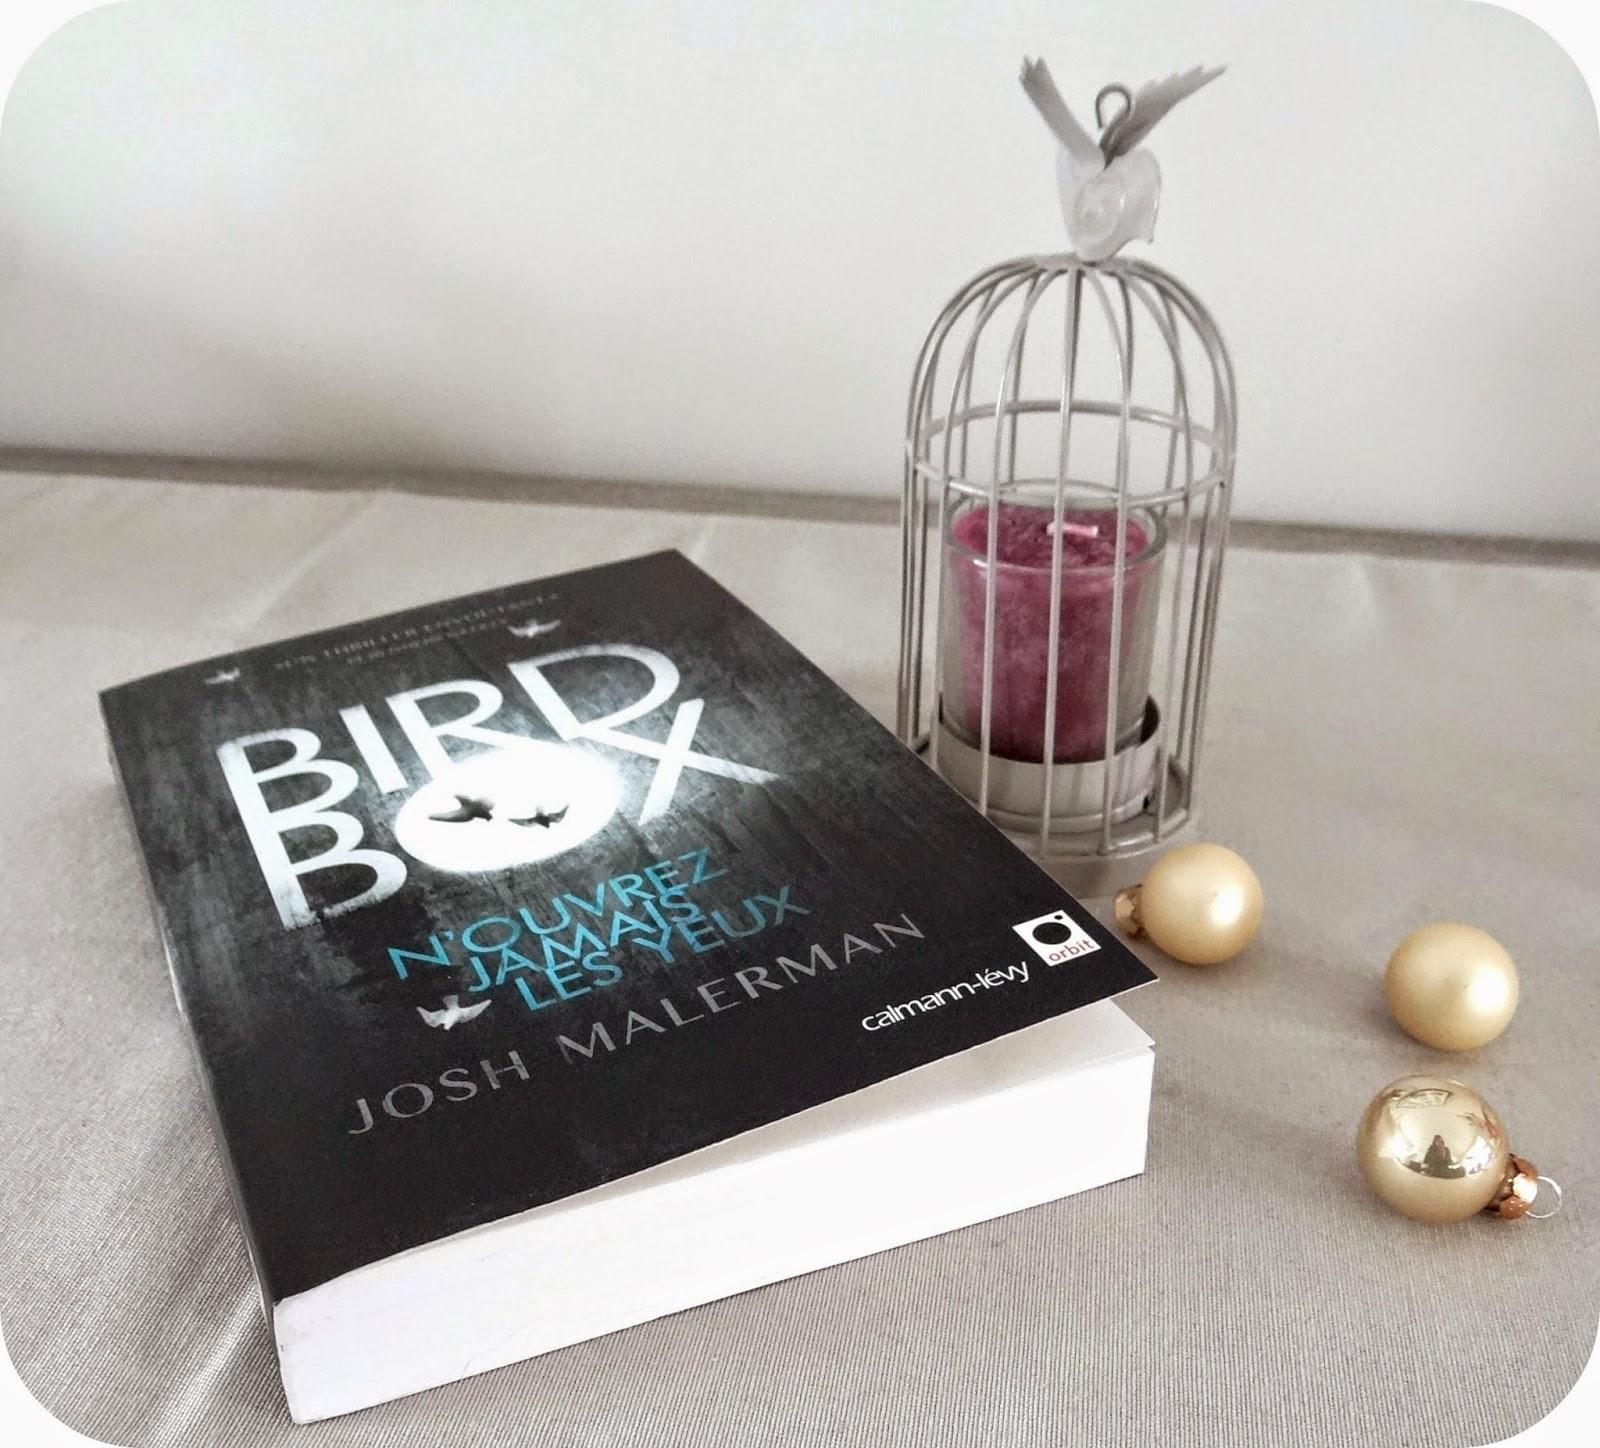 chronique bird box josh malerman éditions calmann-lévy